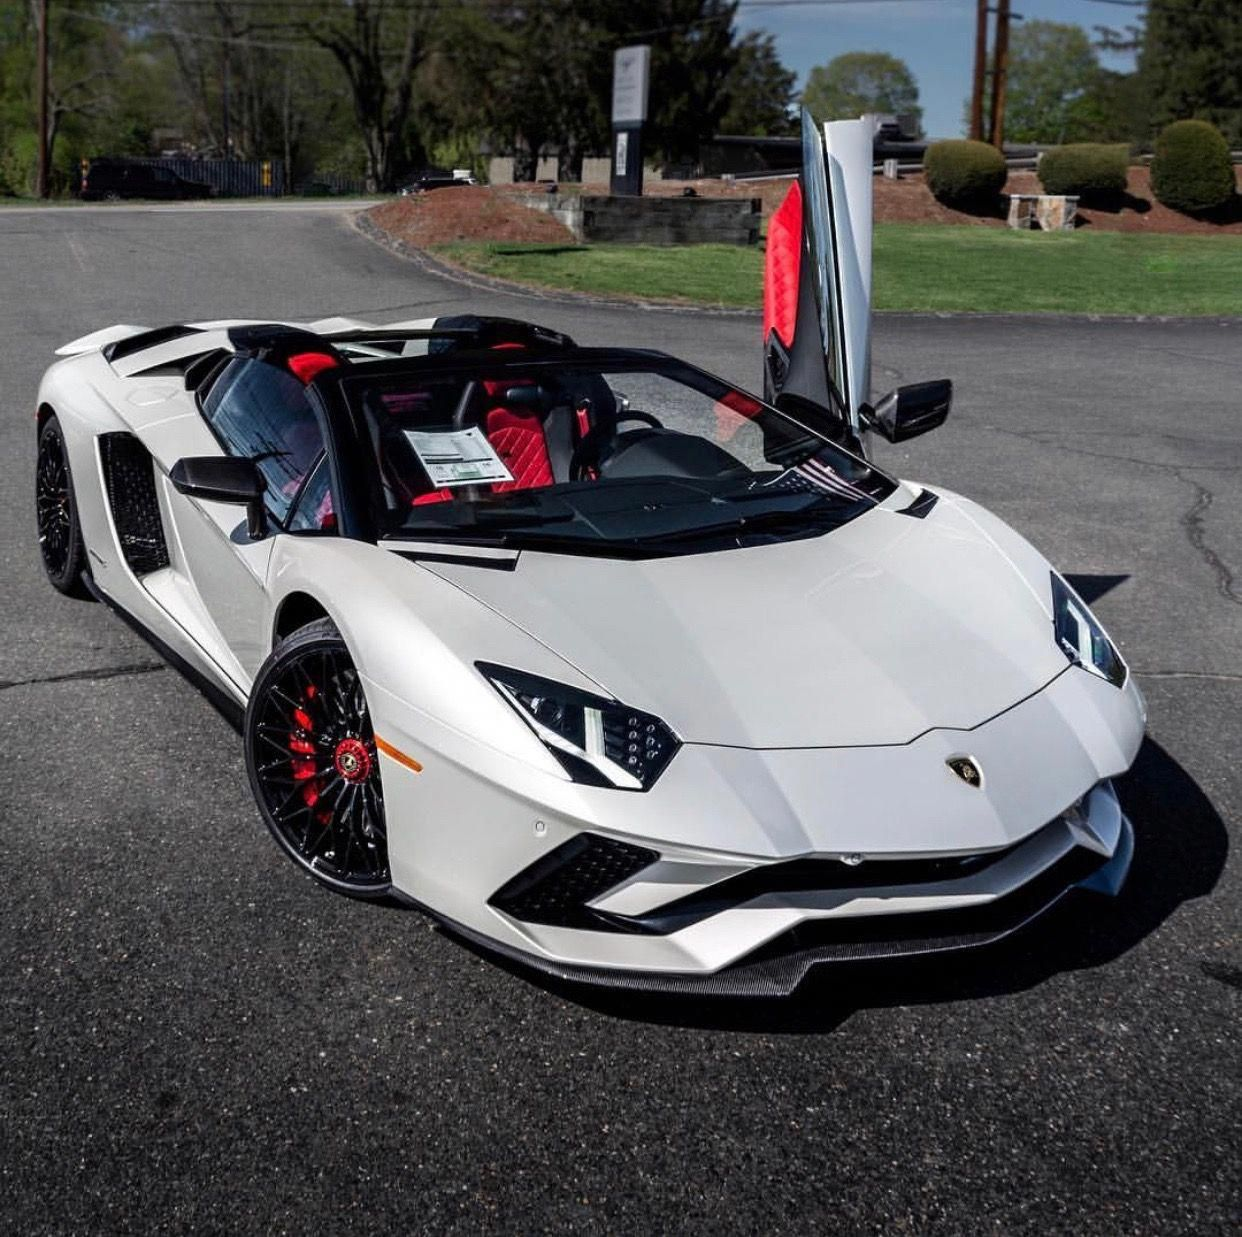 Cars Lamborghini: Lamborghini Aventador S Roadster Painted In Balloon White